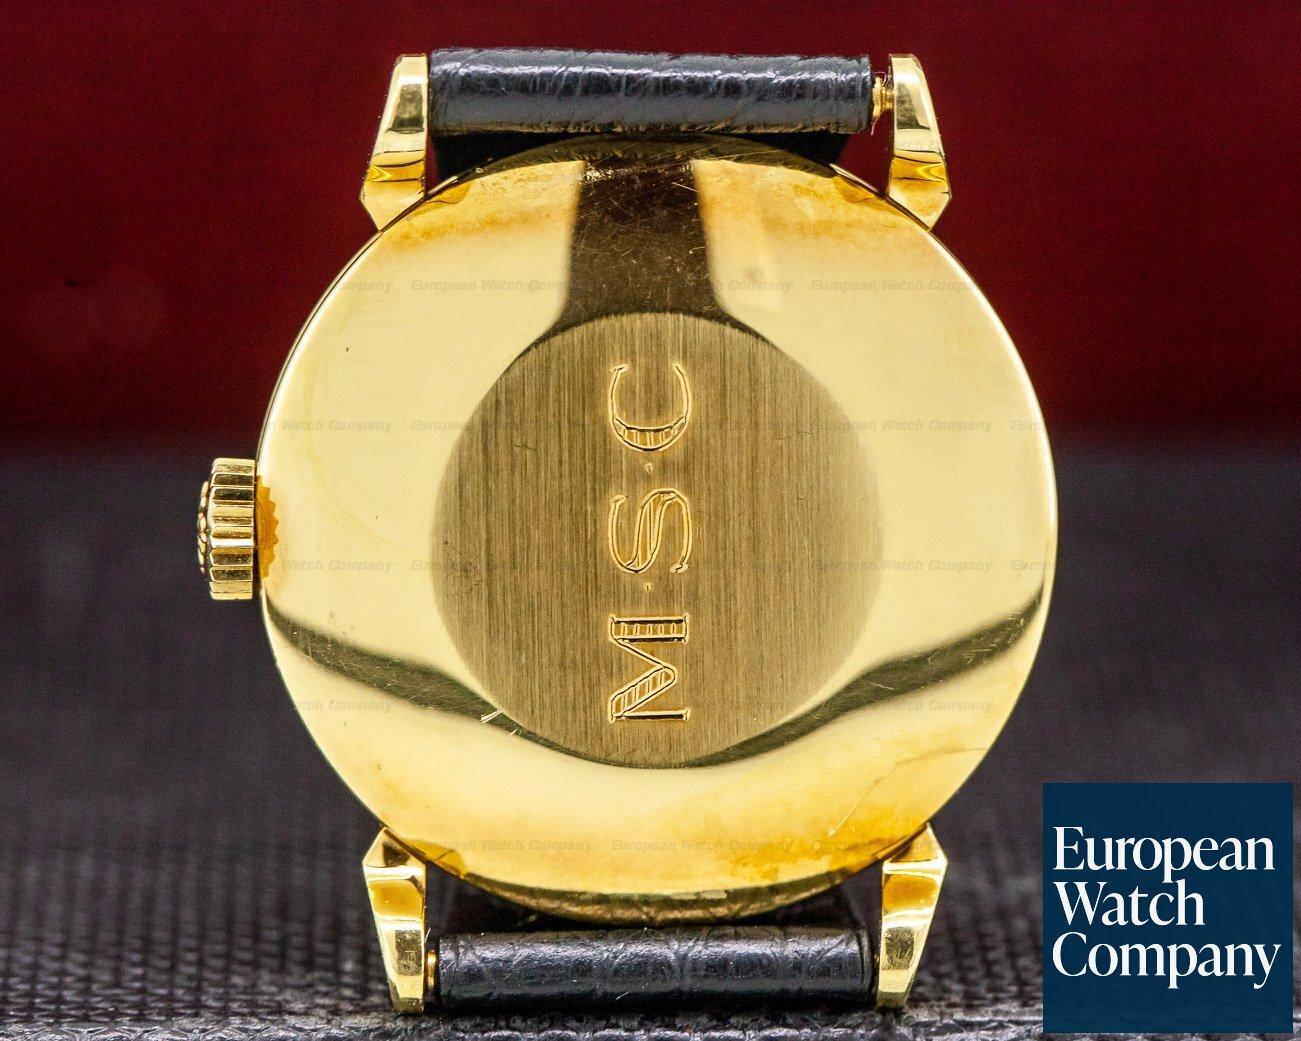 Patek Philippe 1578 Calatrava 18K Yellow Gold Manual Wind 35MM VERY SHARP